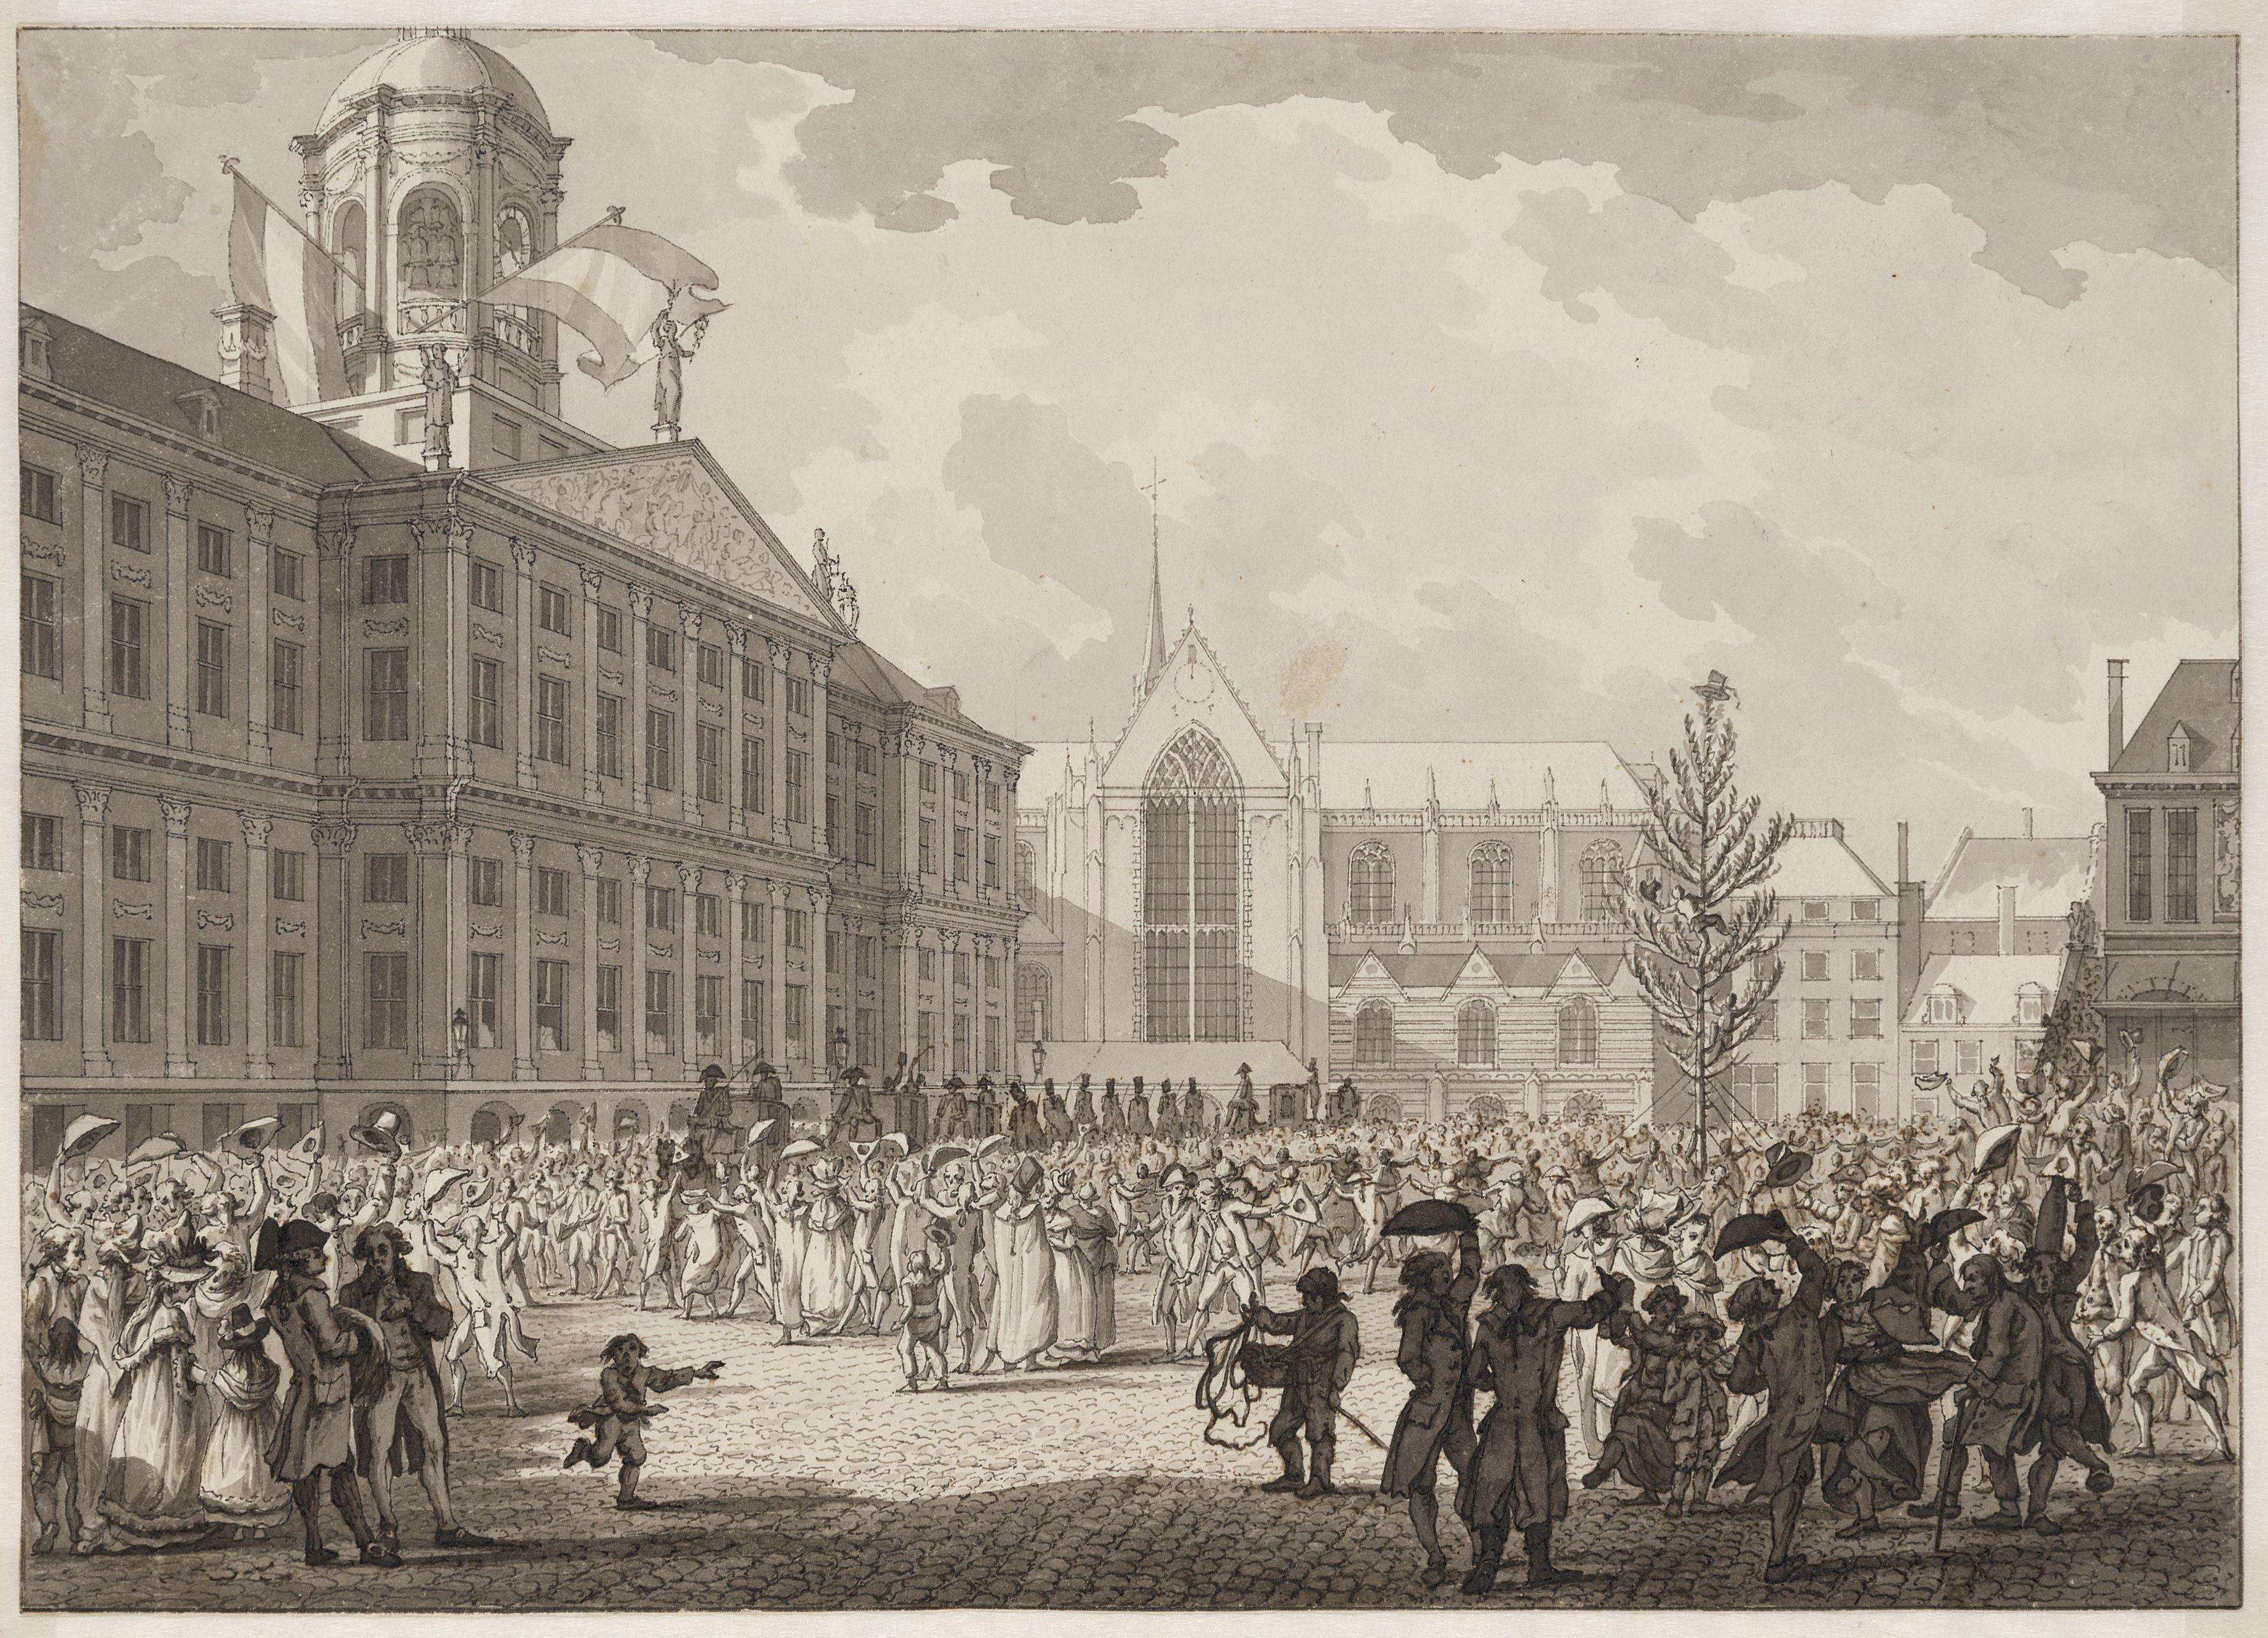 File:Kok, Willem (1761-1807), Afb 010001000318.jpg